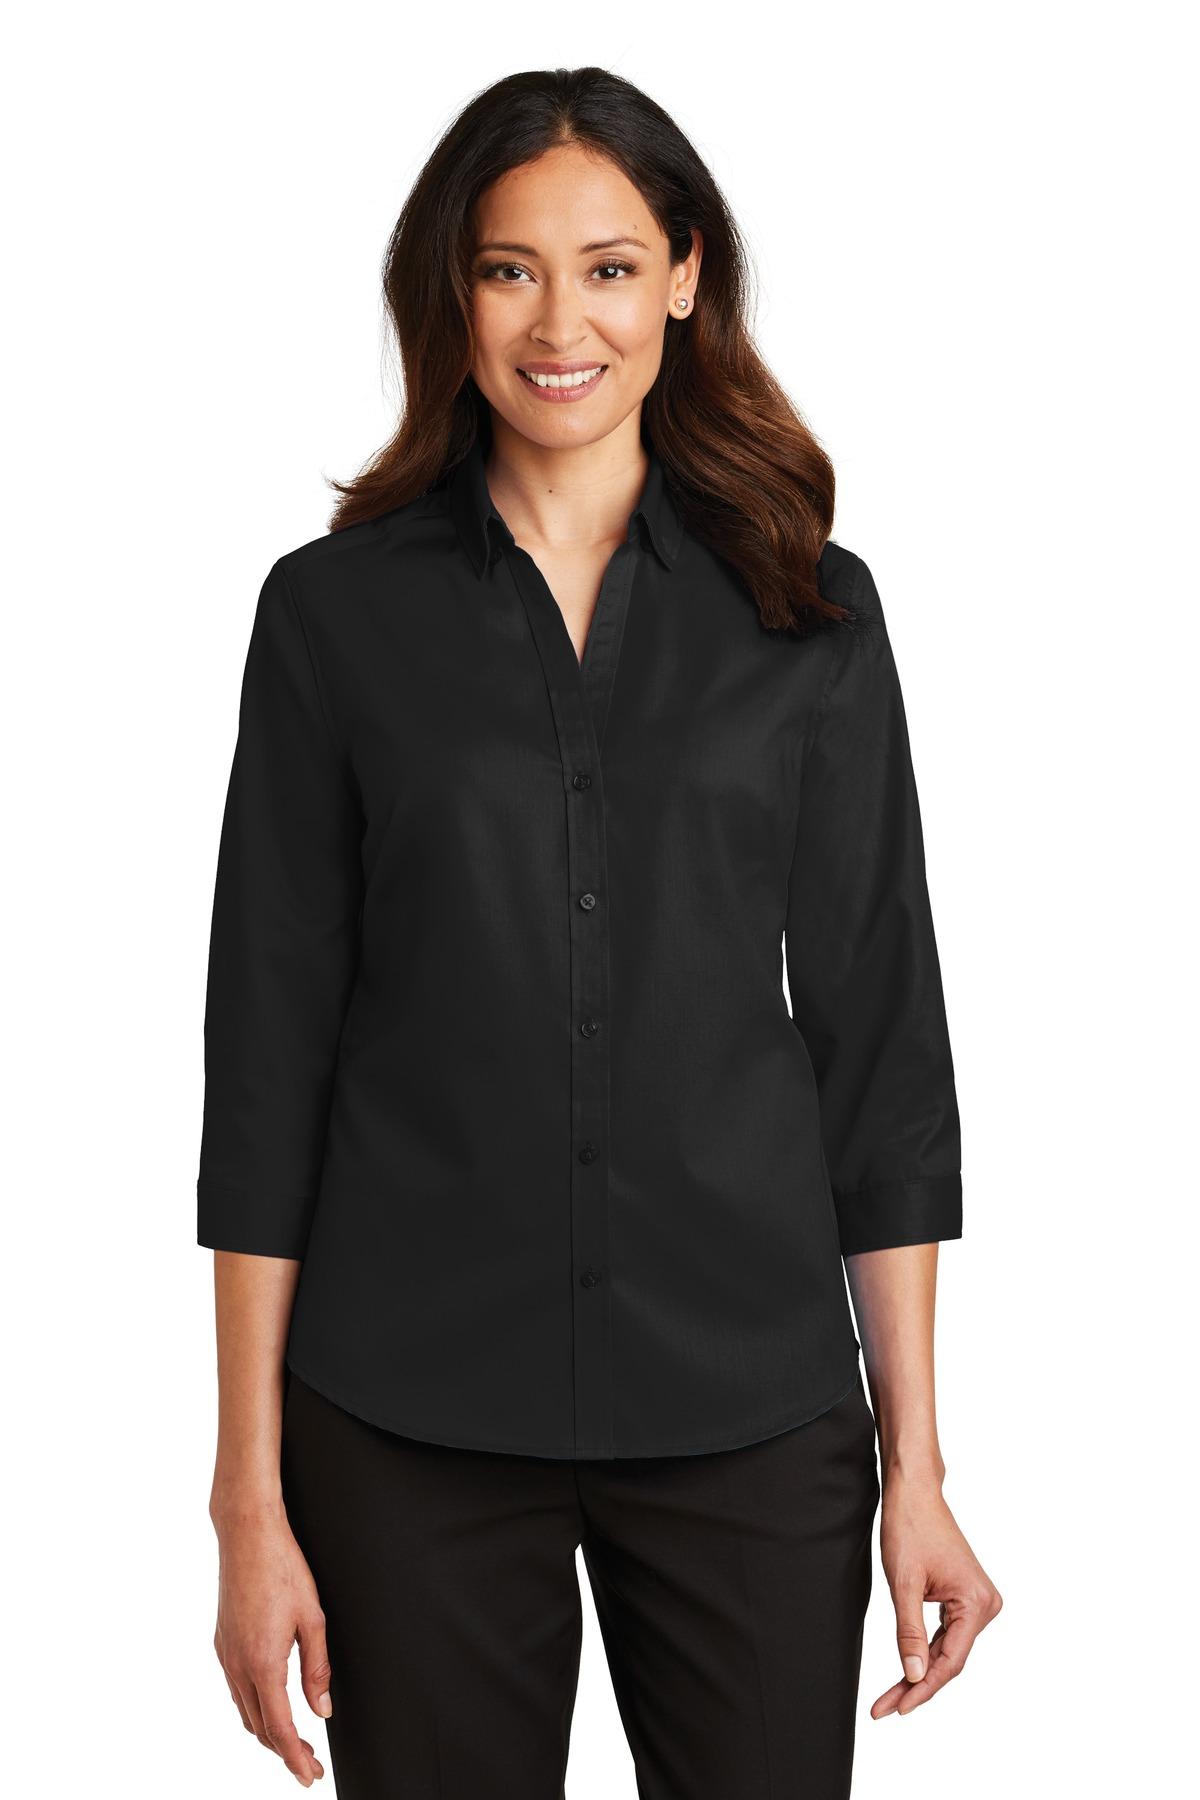 2bc1d36dd ... Port Authority ® Ladies 3/4-Sleeve SuperPro ™ Twill Shirt. L665.  Previous; Next